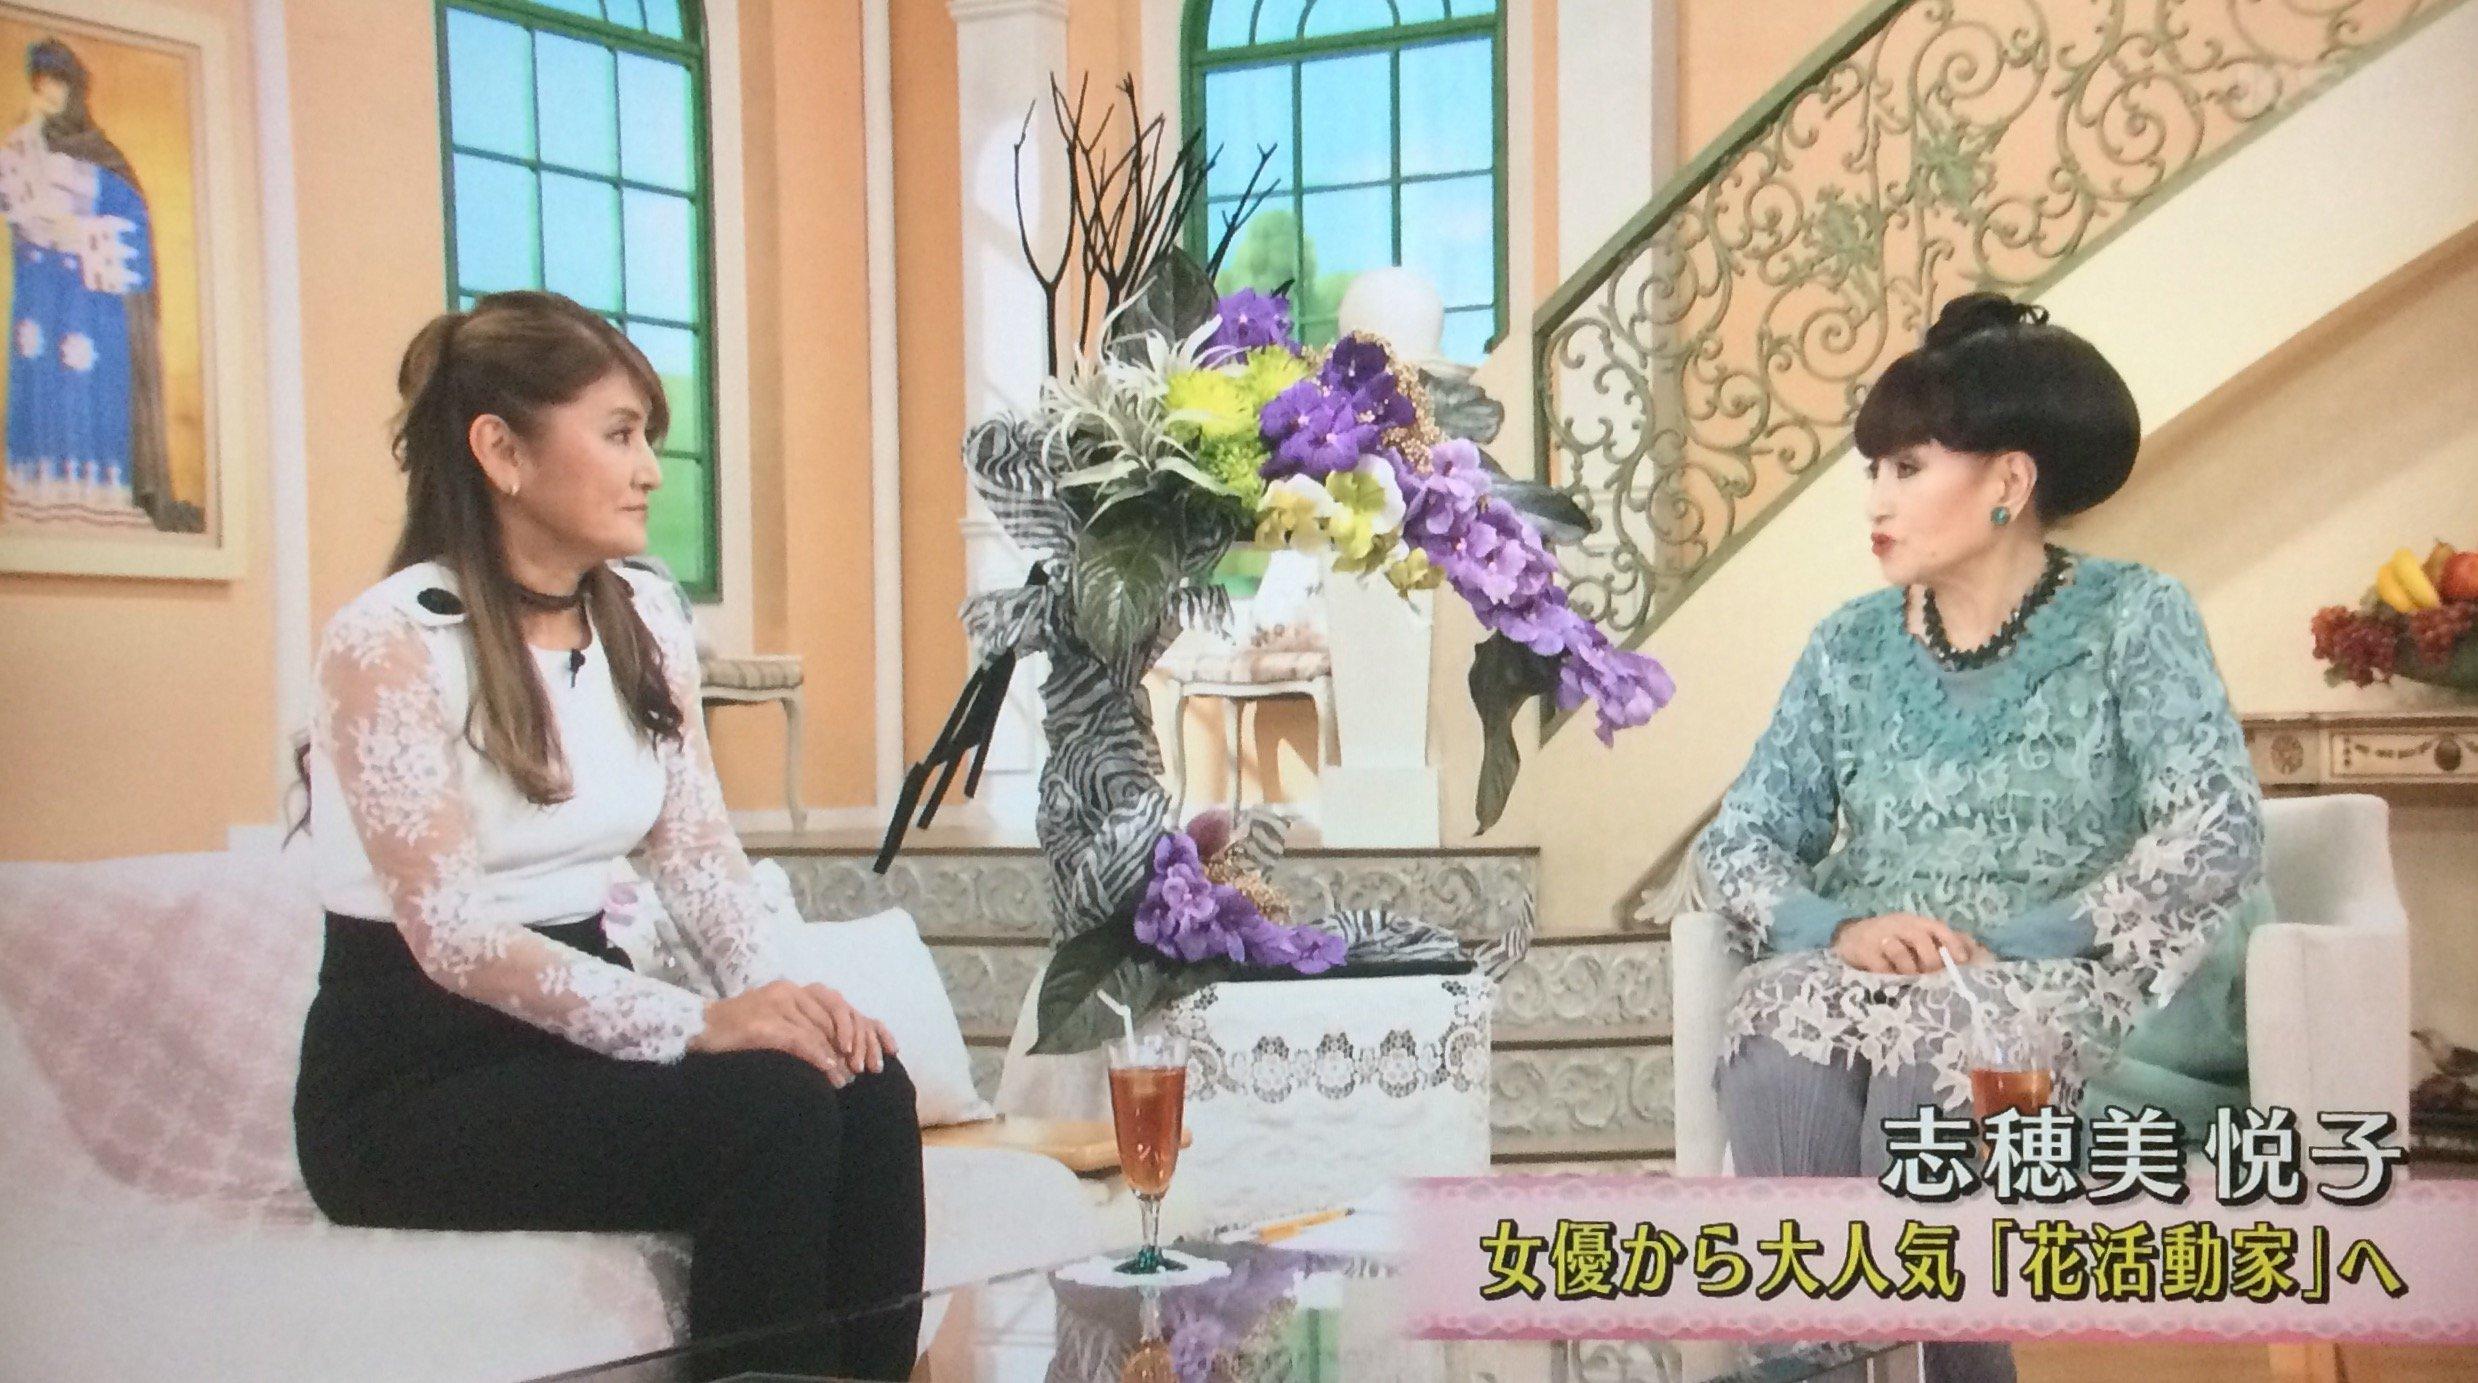 20 1 1.jpg?resize=300,169 - アクション女優として活躍した志穂美悦子の現在